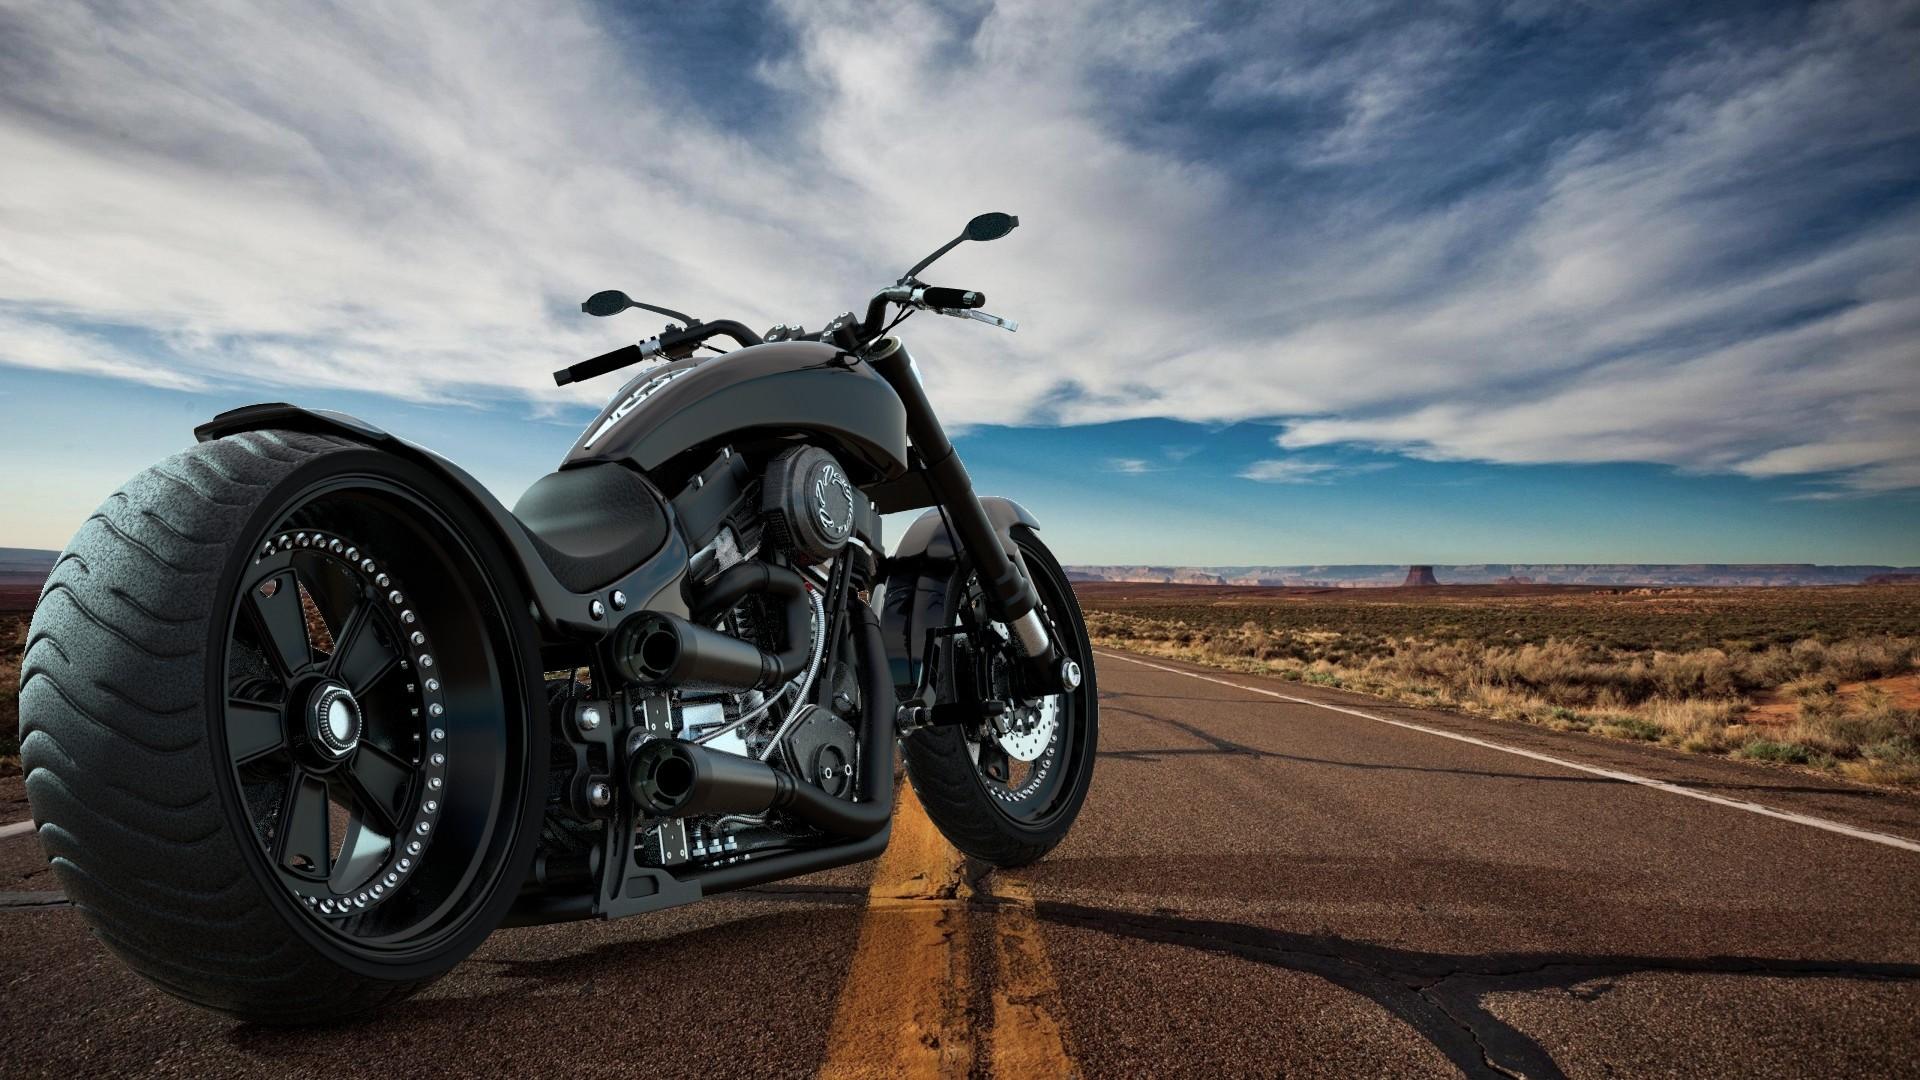 Motorcycle HD Wallpaper